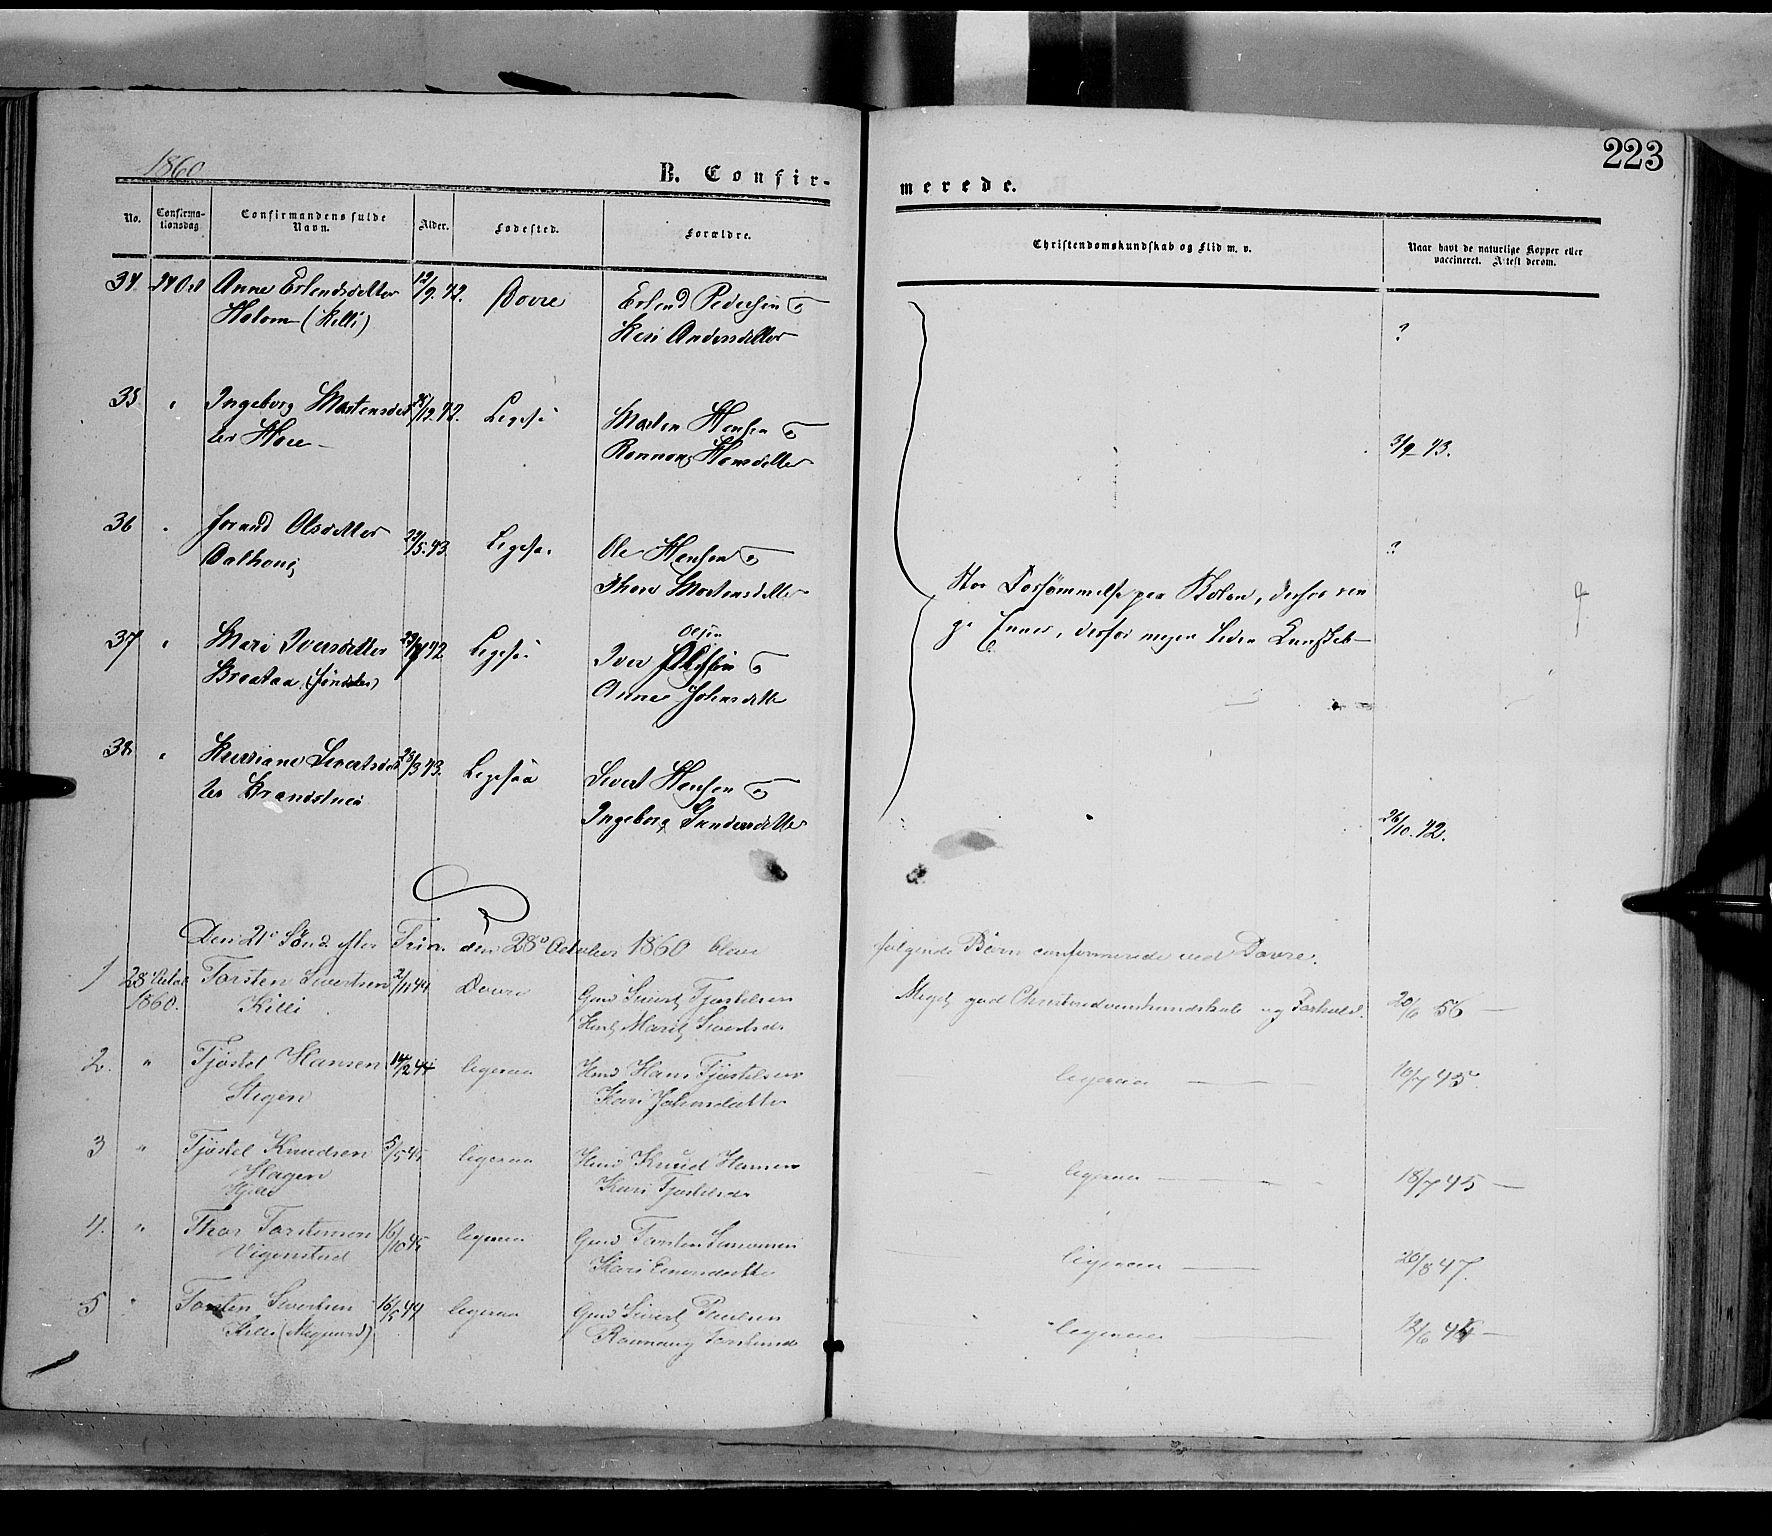 SAH, Dovre prestekontor, Ministerialbok nr. 1, 1854-1878, s. 223